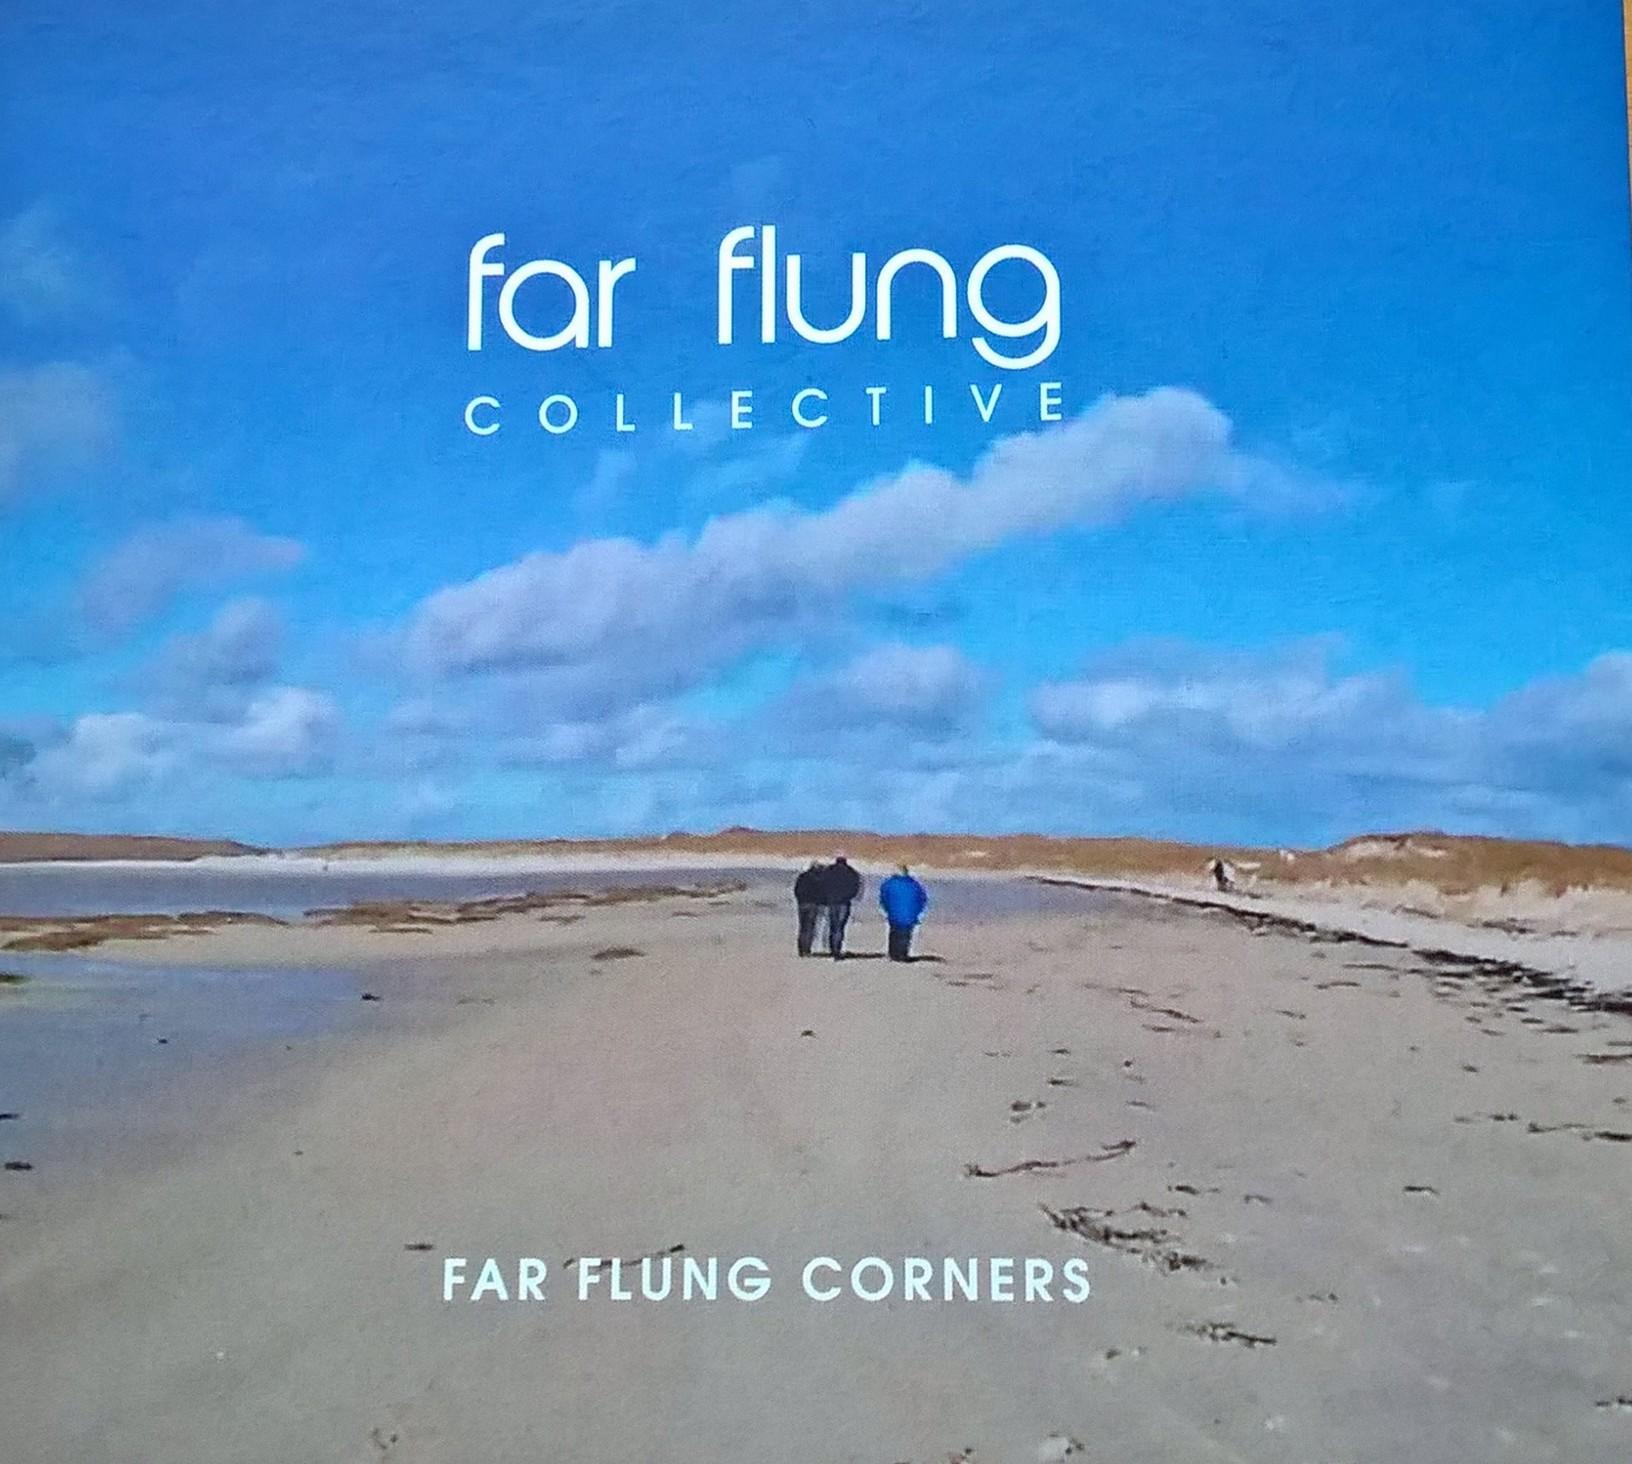 2961Far Flung Corners